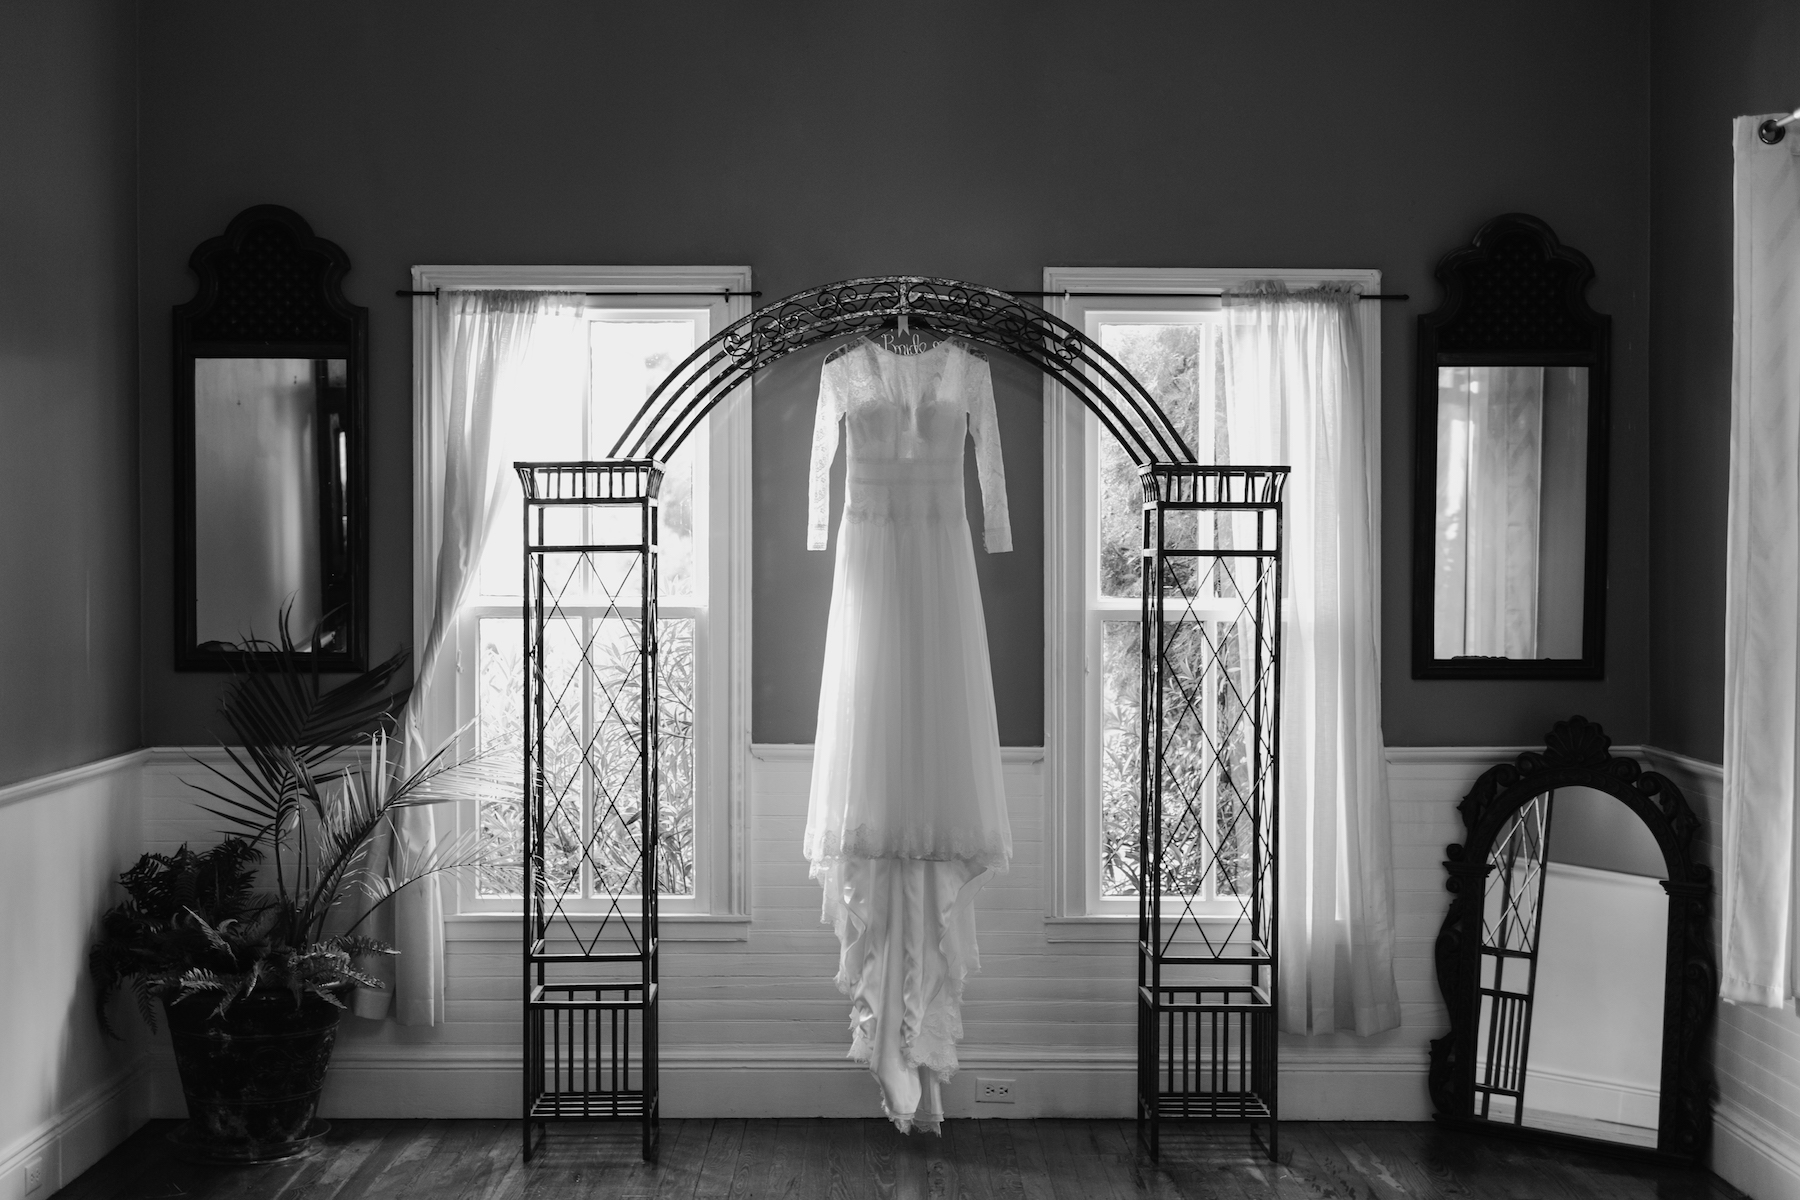 South-Carolina-Wedding-Engagement-Bridal-Photographer-Columbia-Greenville-Spartanburg-707.JPG